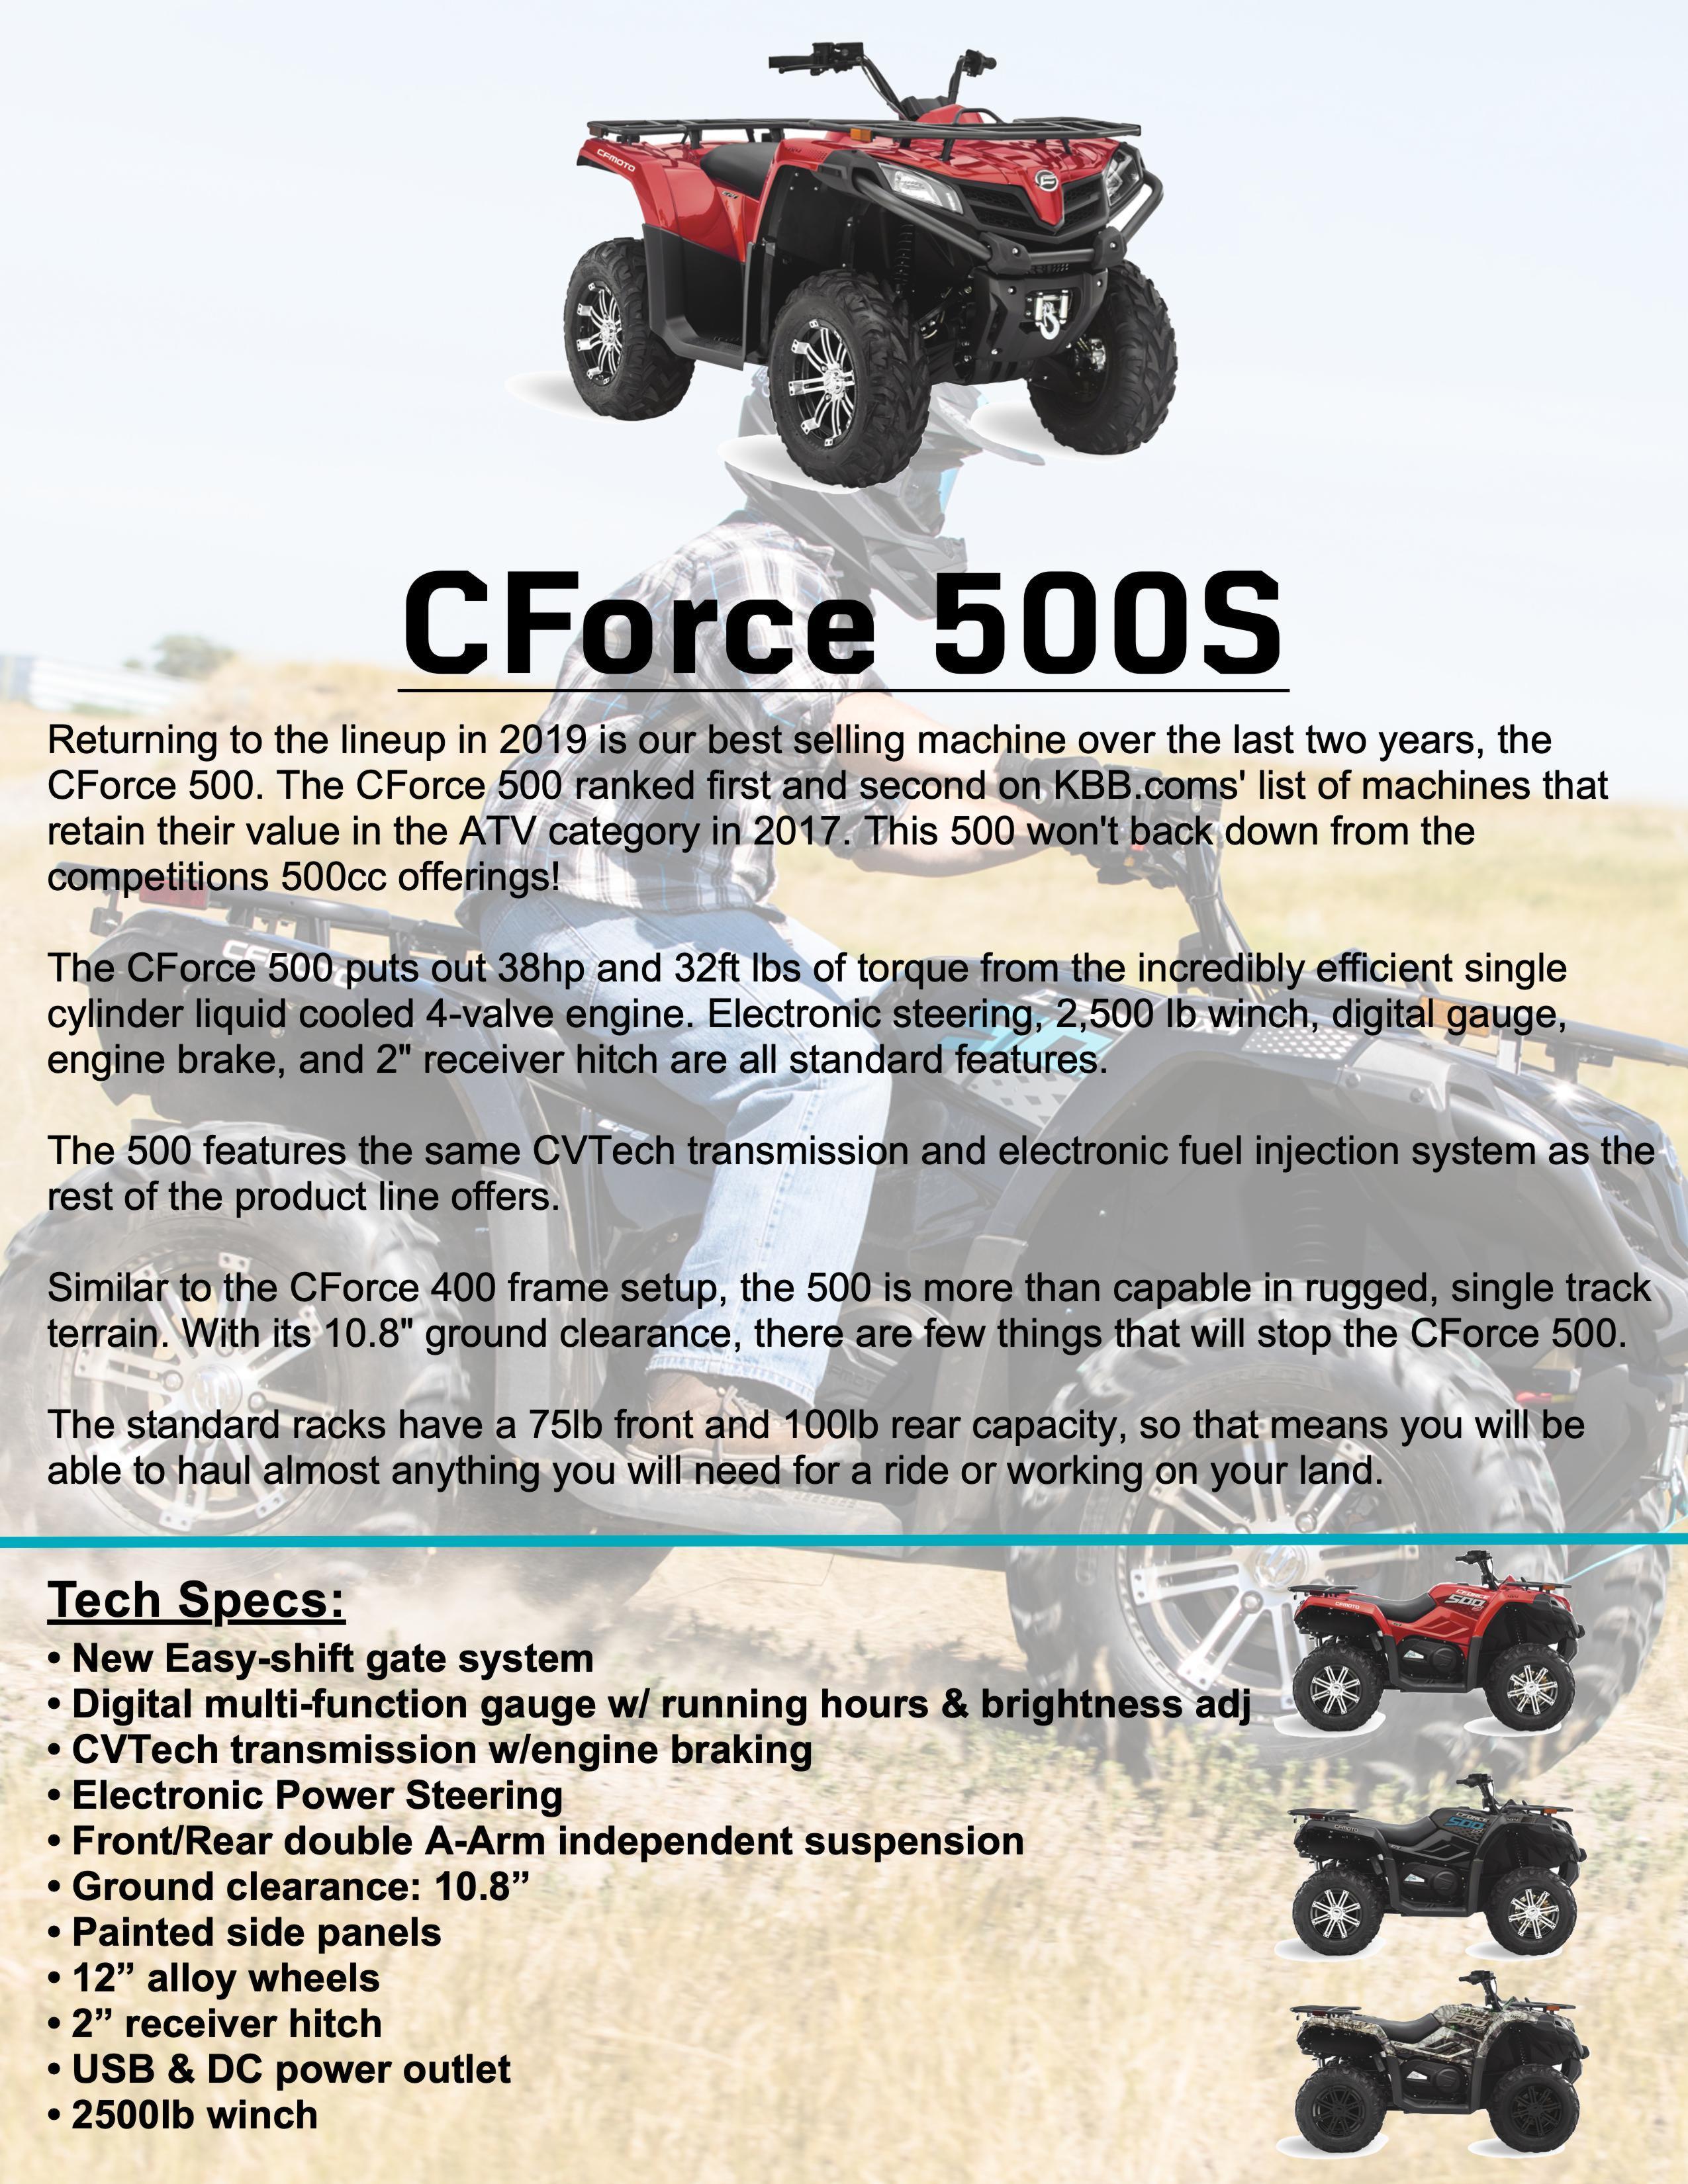 CFORCE 500S